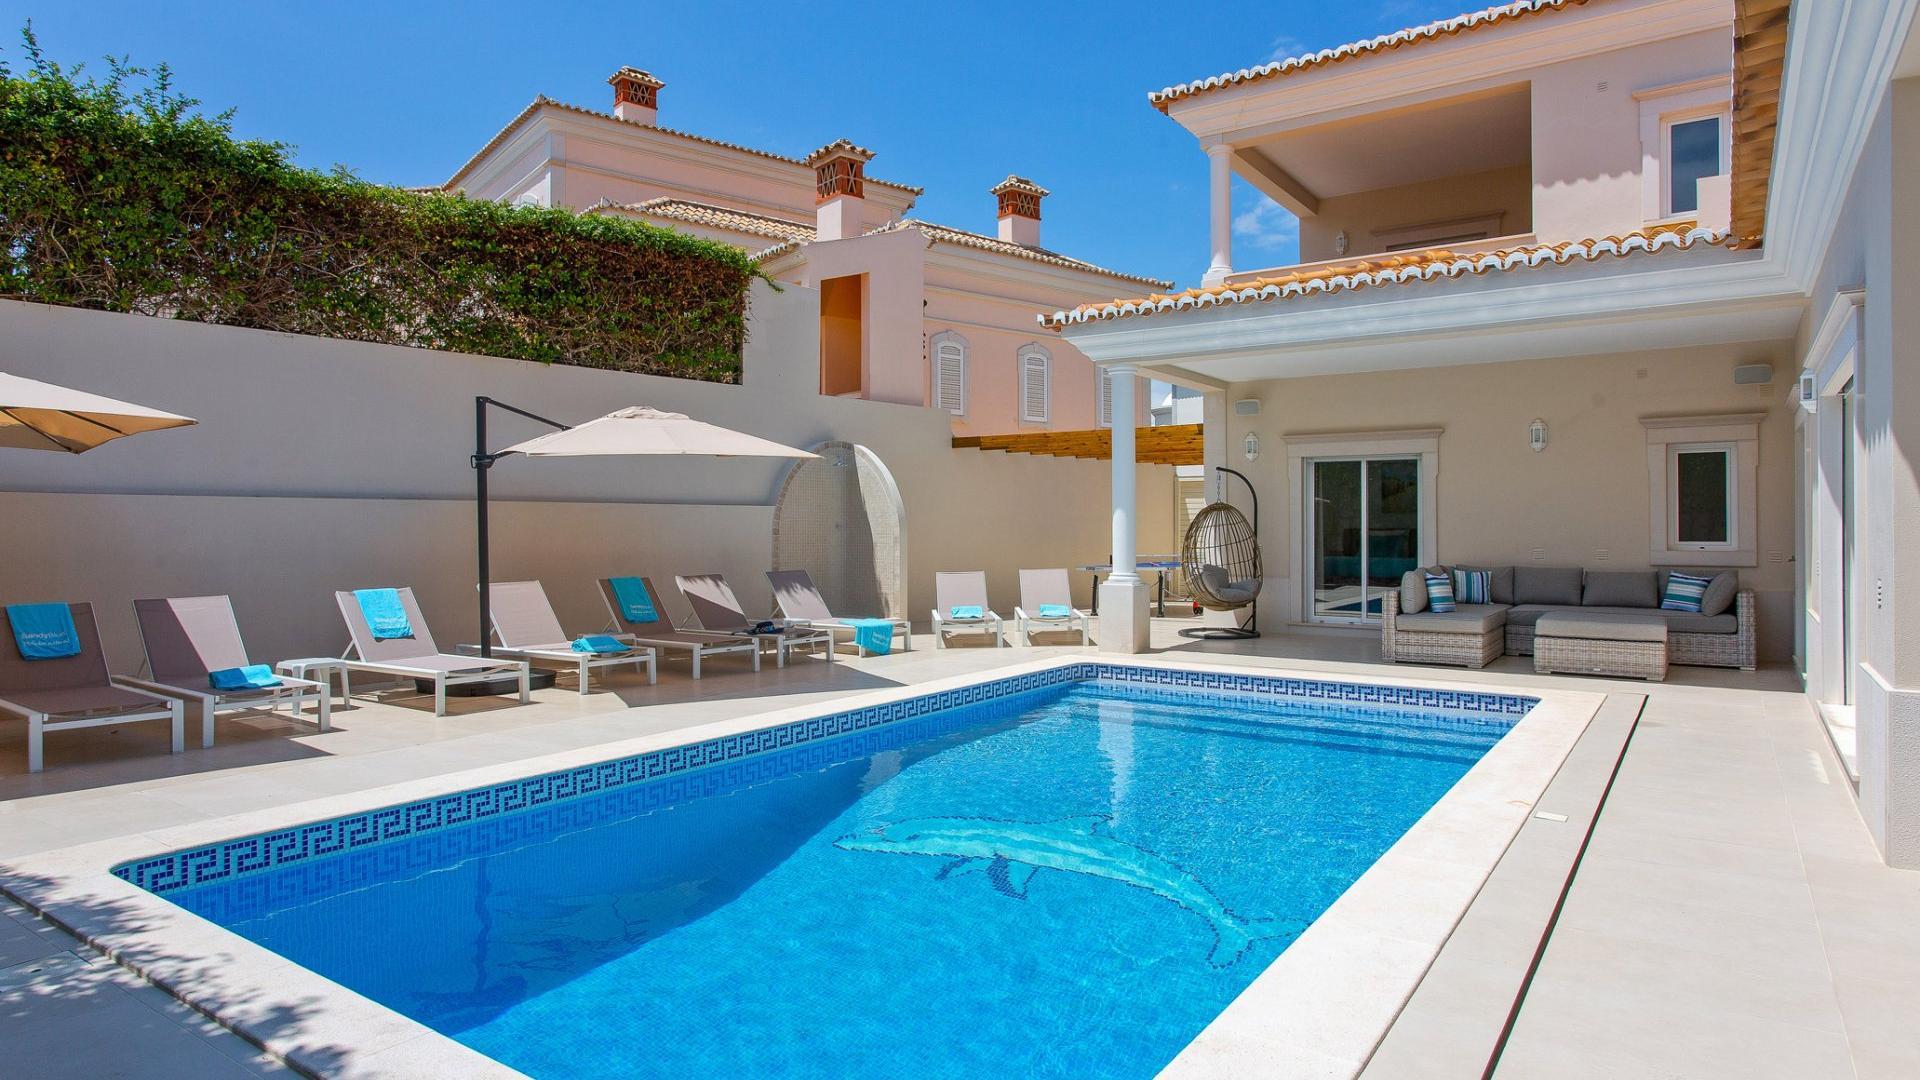 Location maison avec piscine portugal faro ventana blog - Location maison algarve avec piscine ...